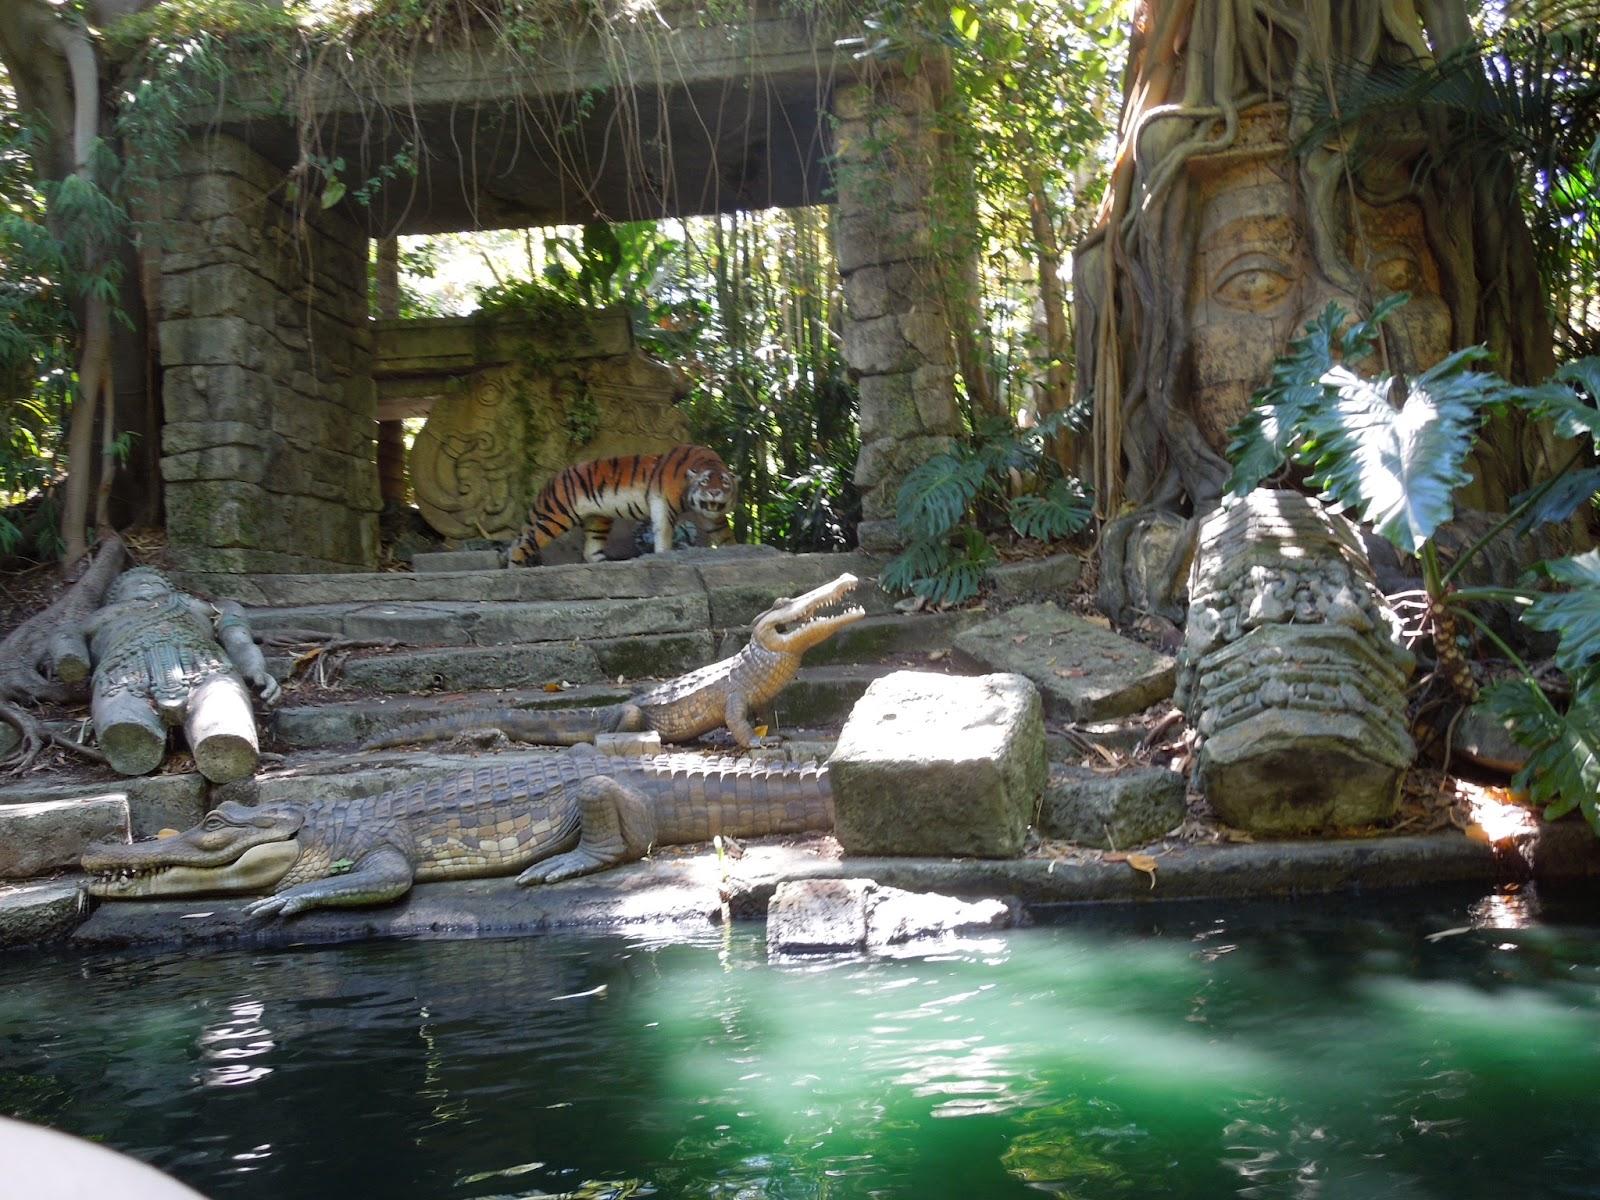 A Cutermouse View of Adventureland: - 435.5KB